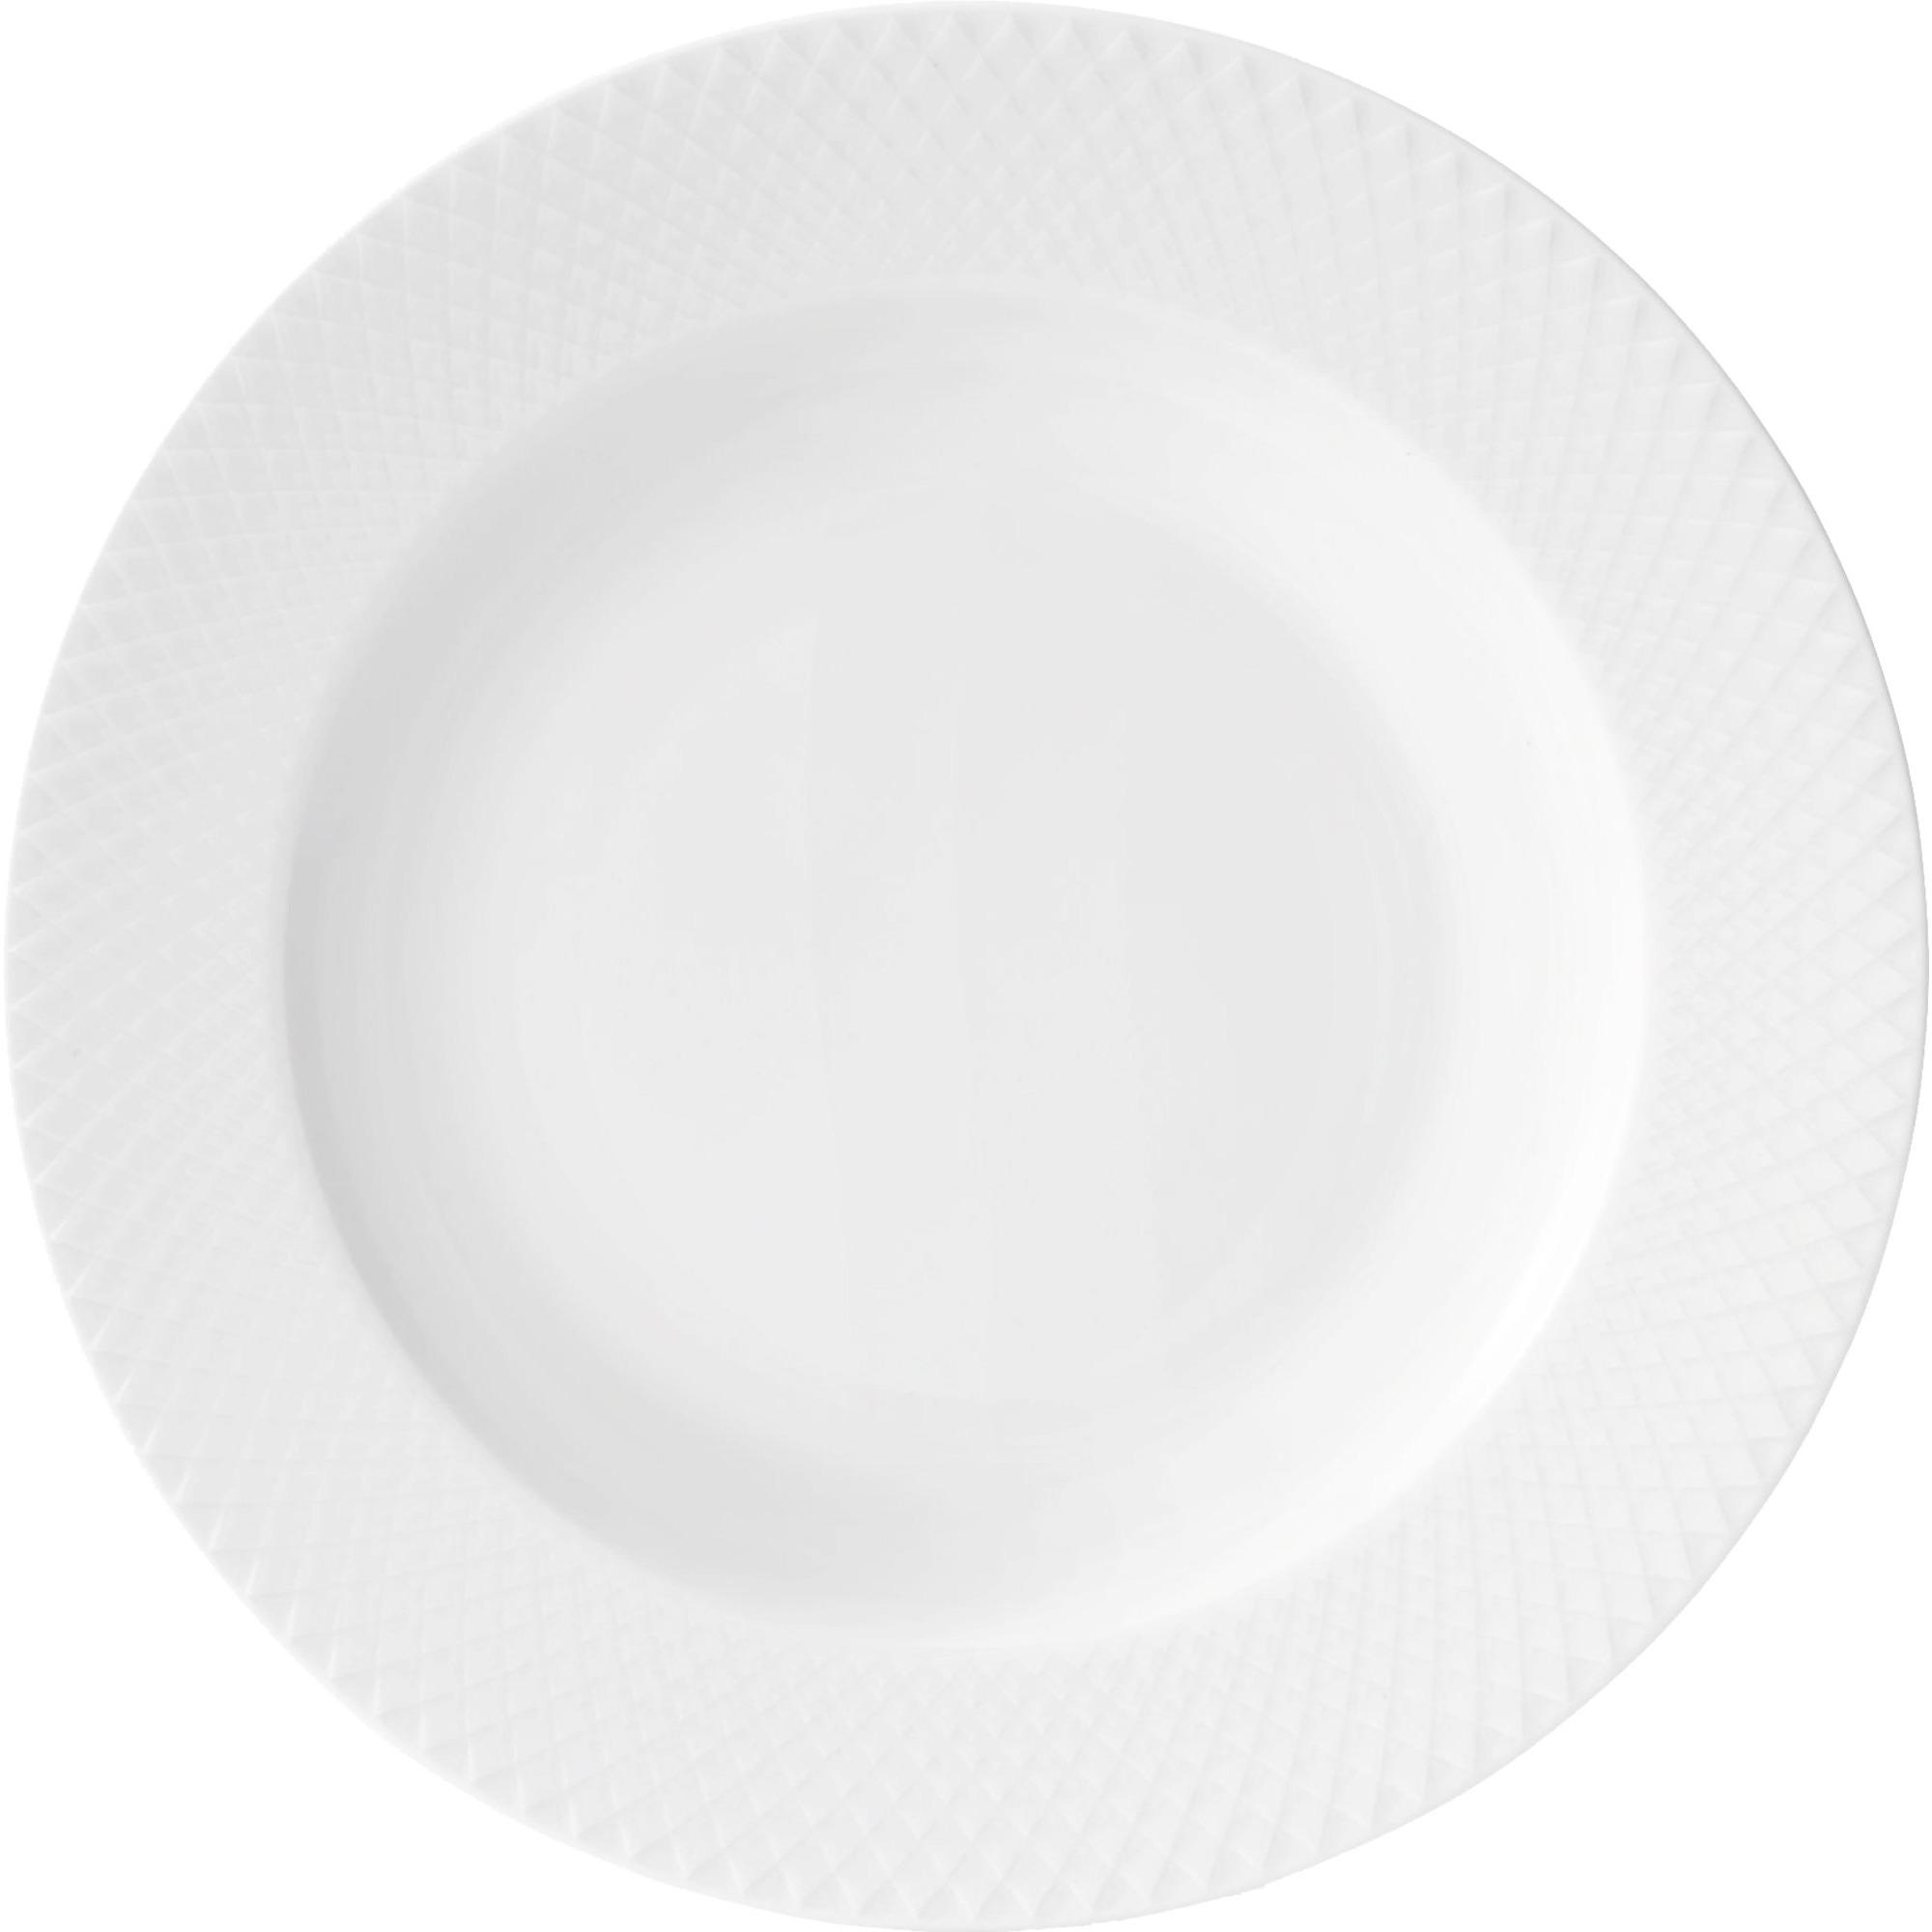 Lyngby Porcelæn Rhombe Djuptallrik 23 cm Vit